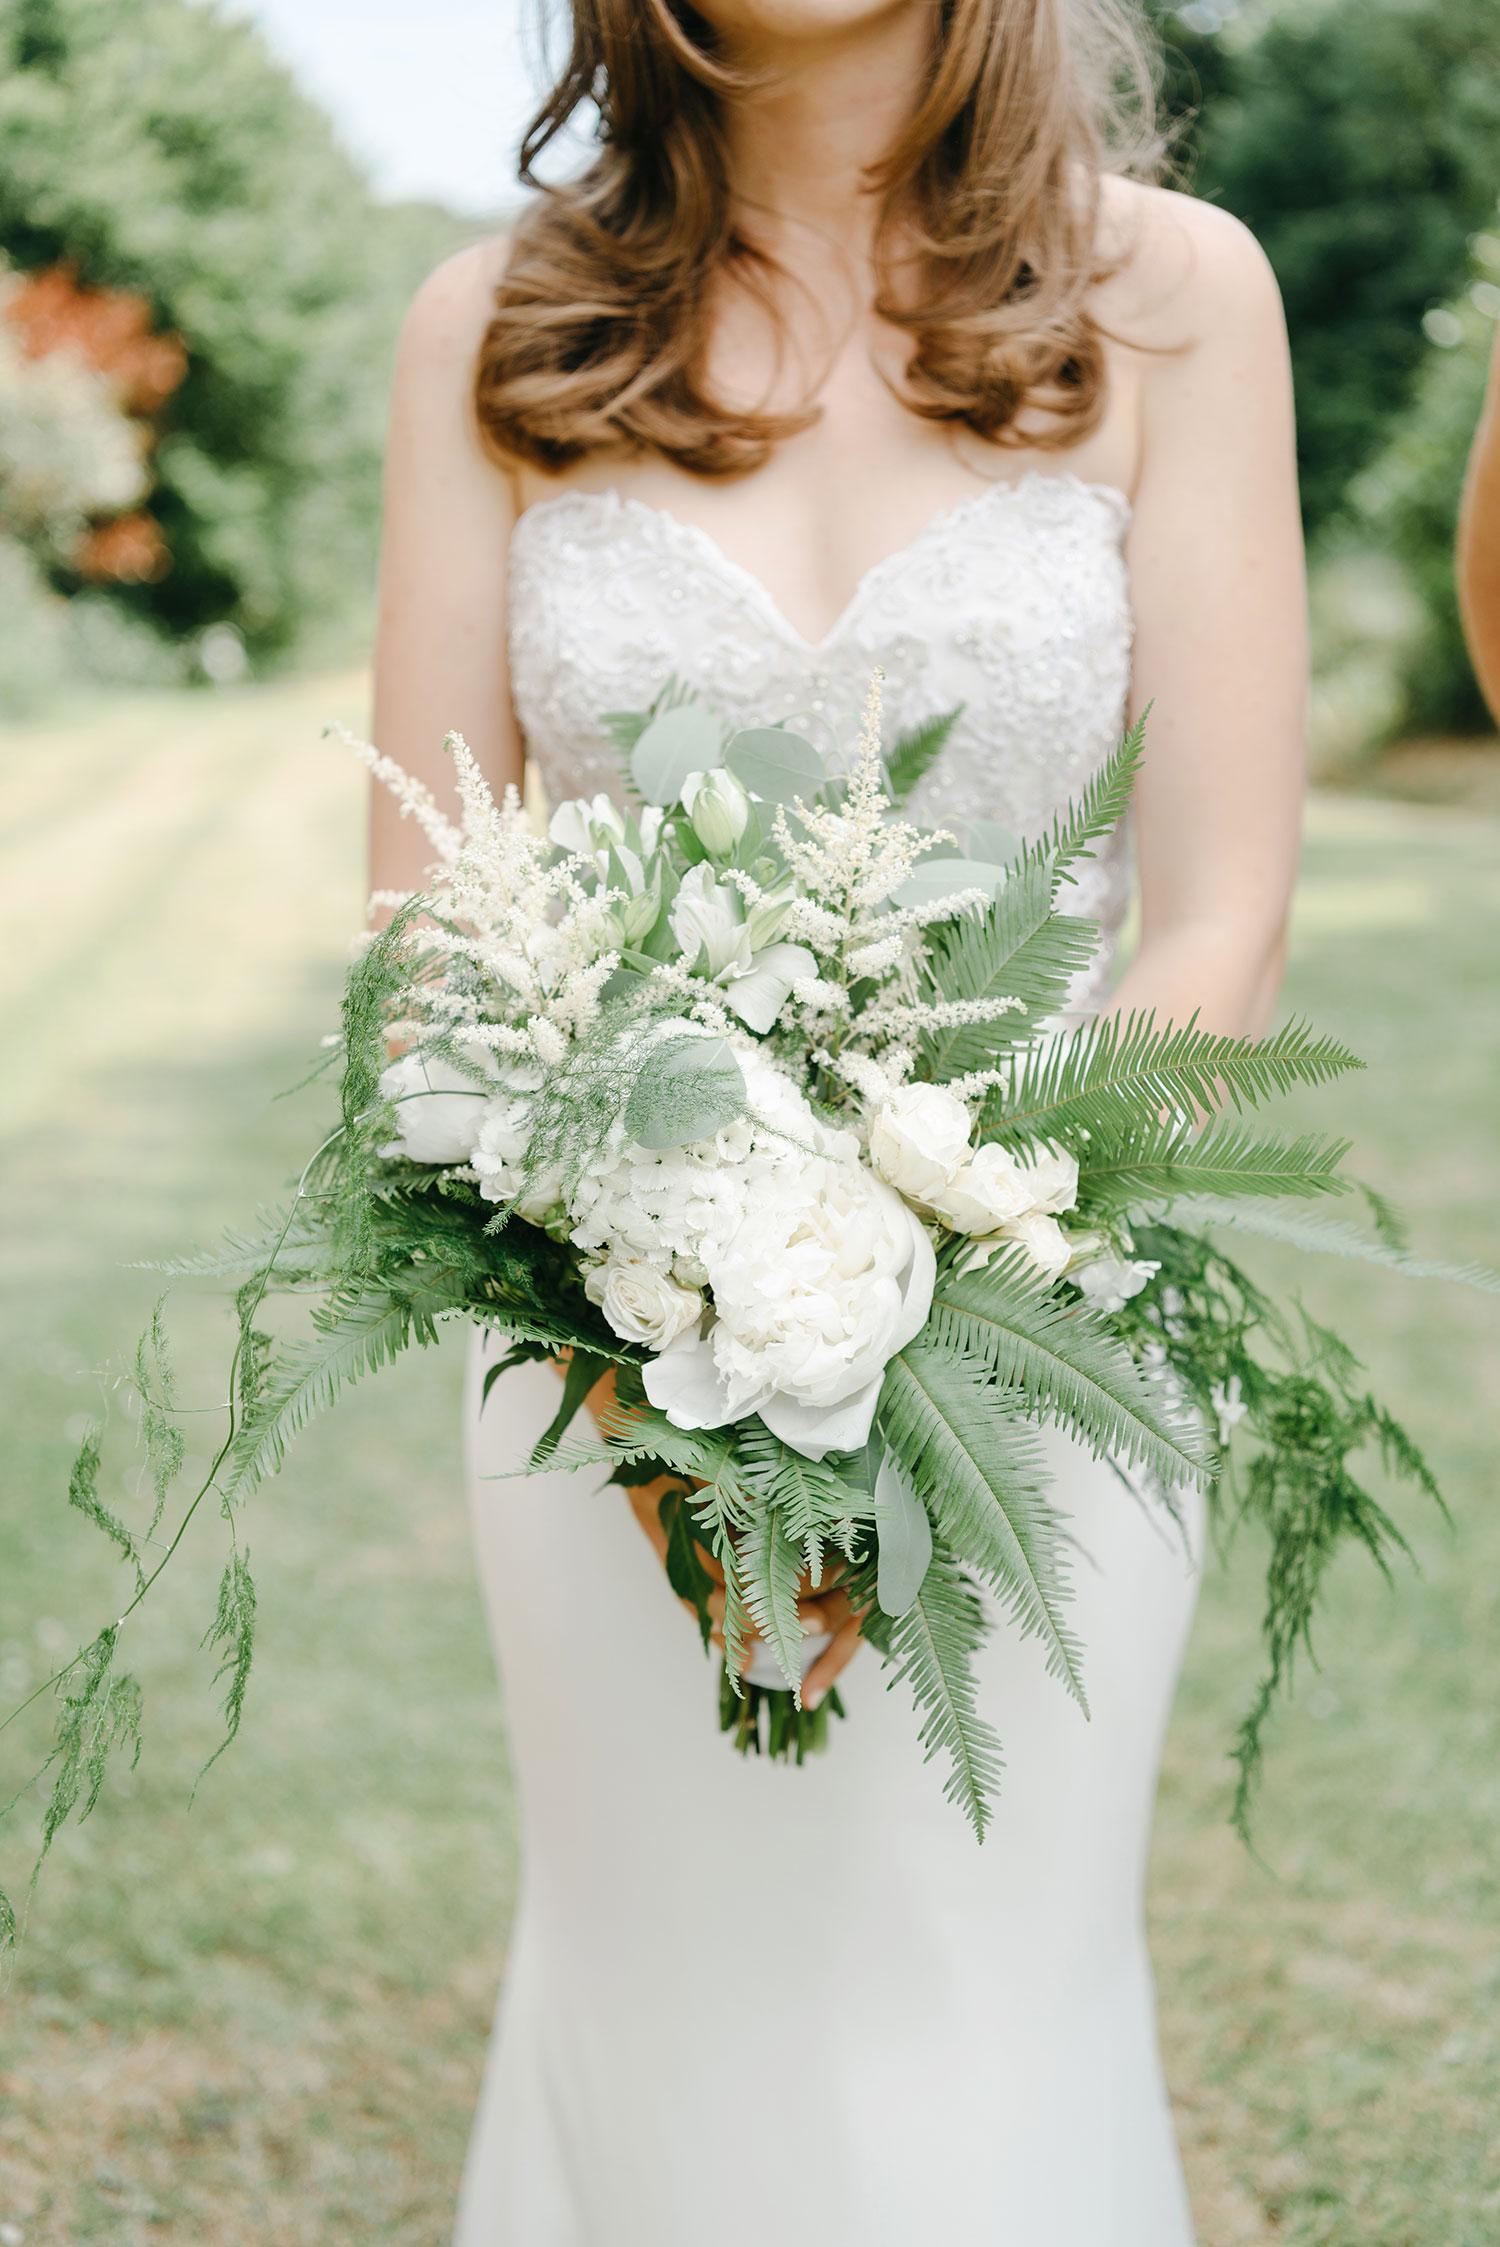 destination-wedding-photographer-ballinacurra-house-wedding-20180711_0059.jpg